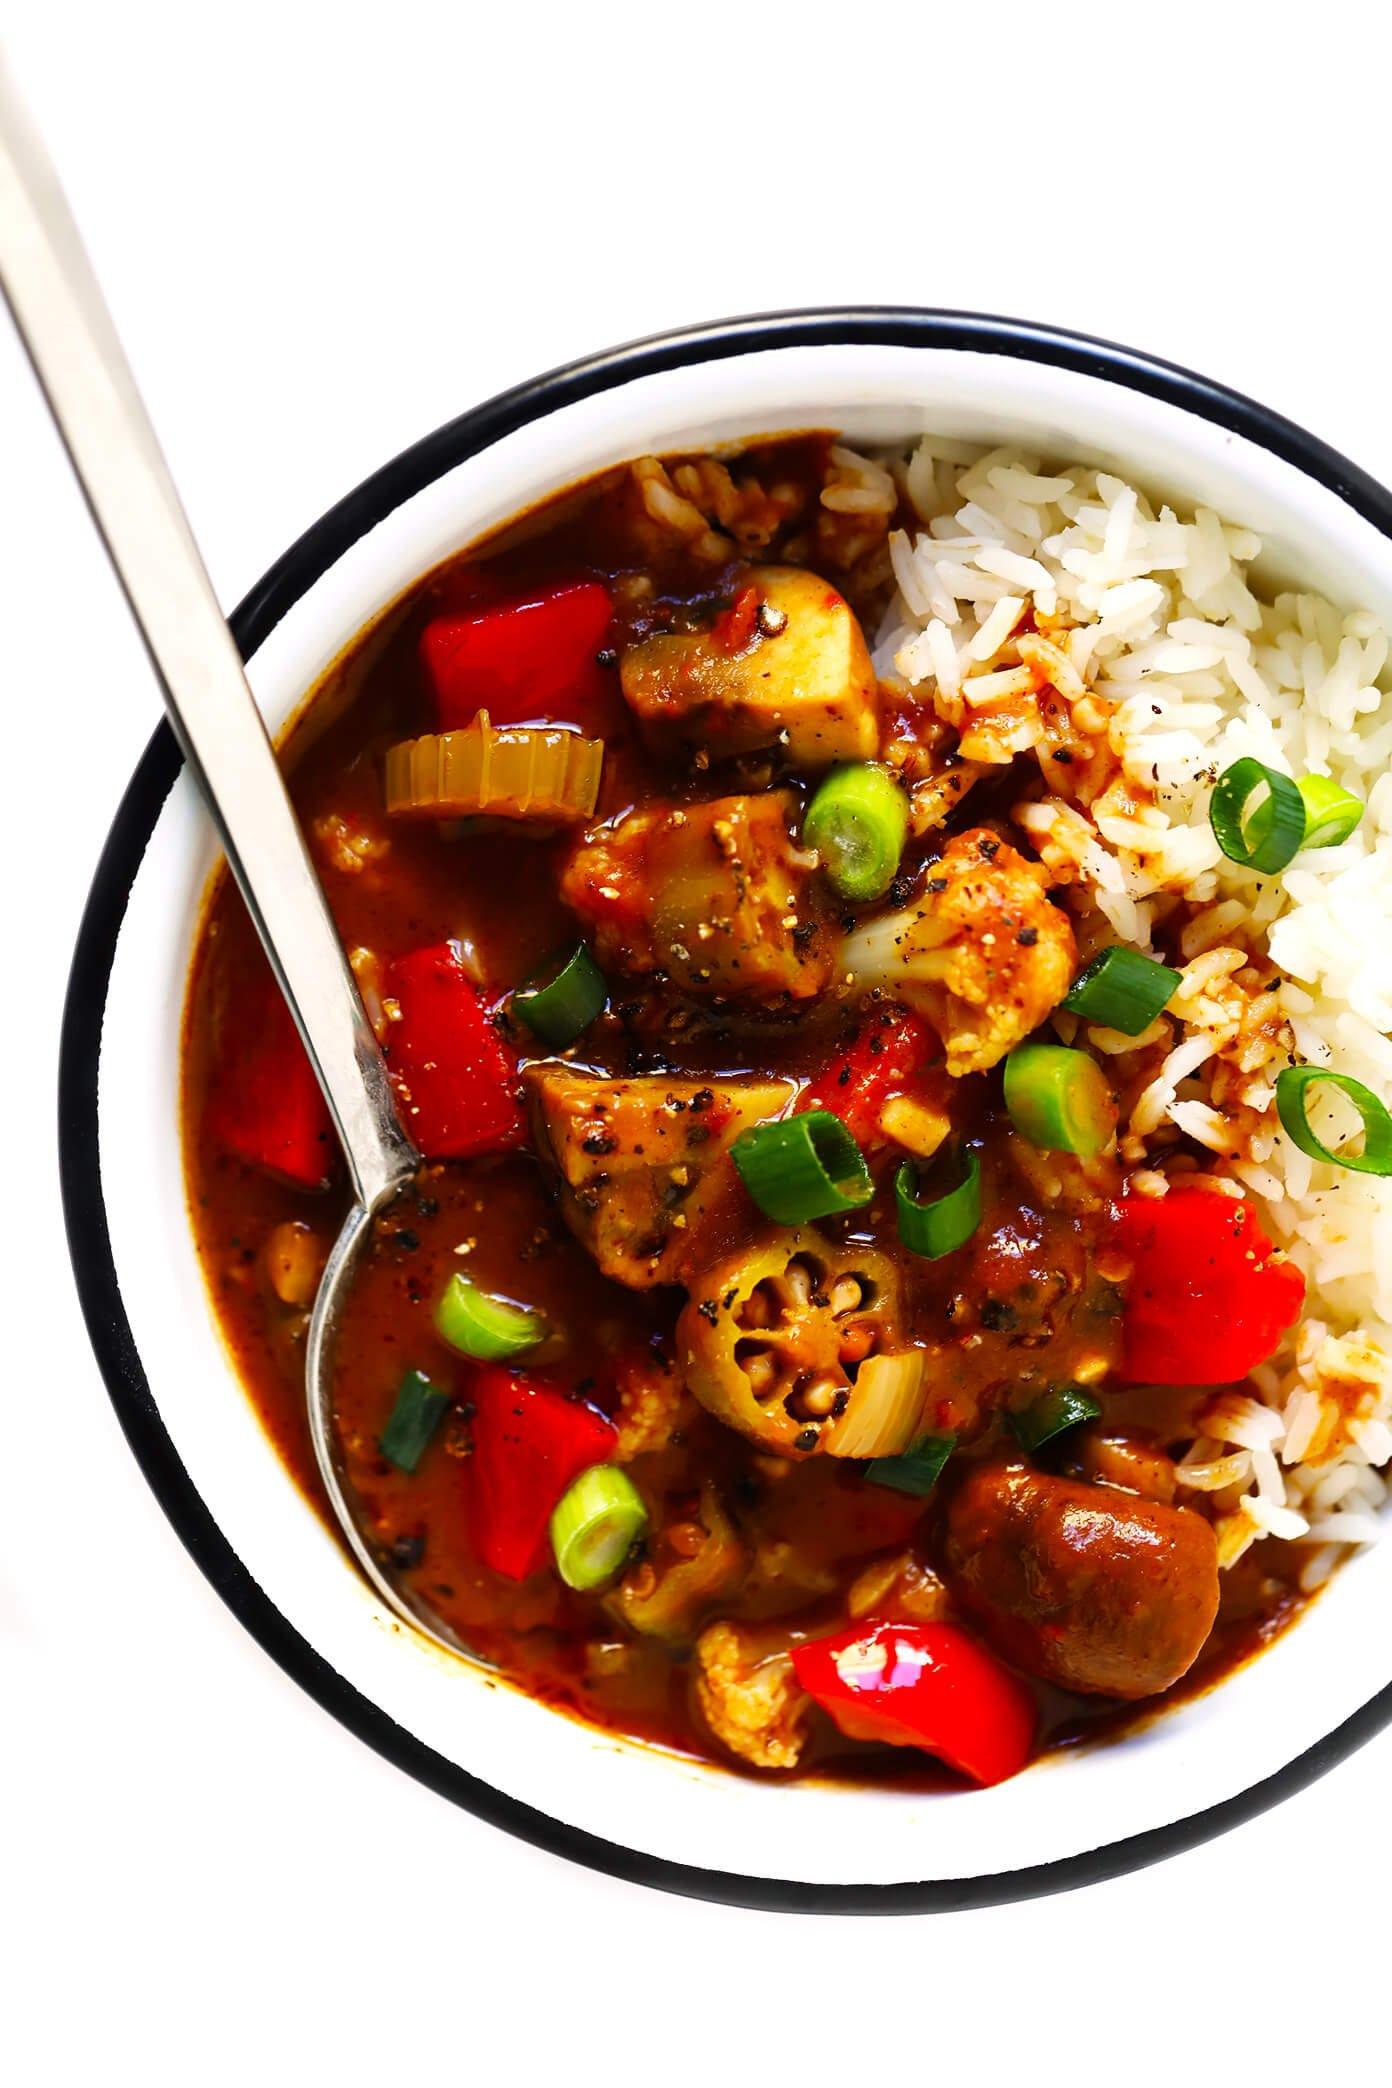 Vegetarian Gumbo Recipe with Rice